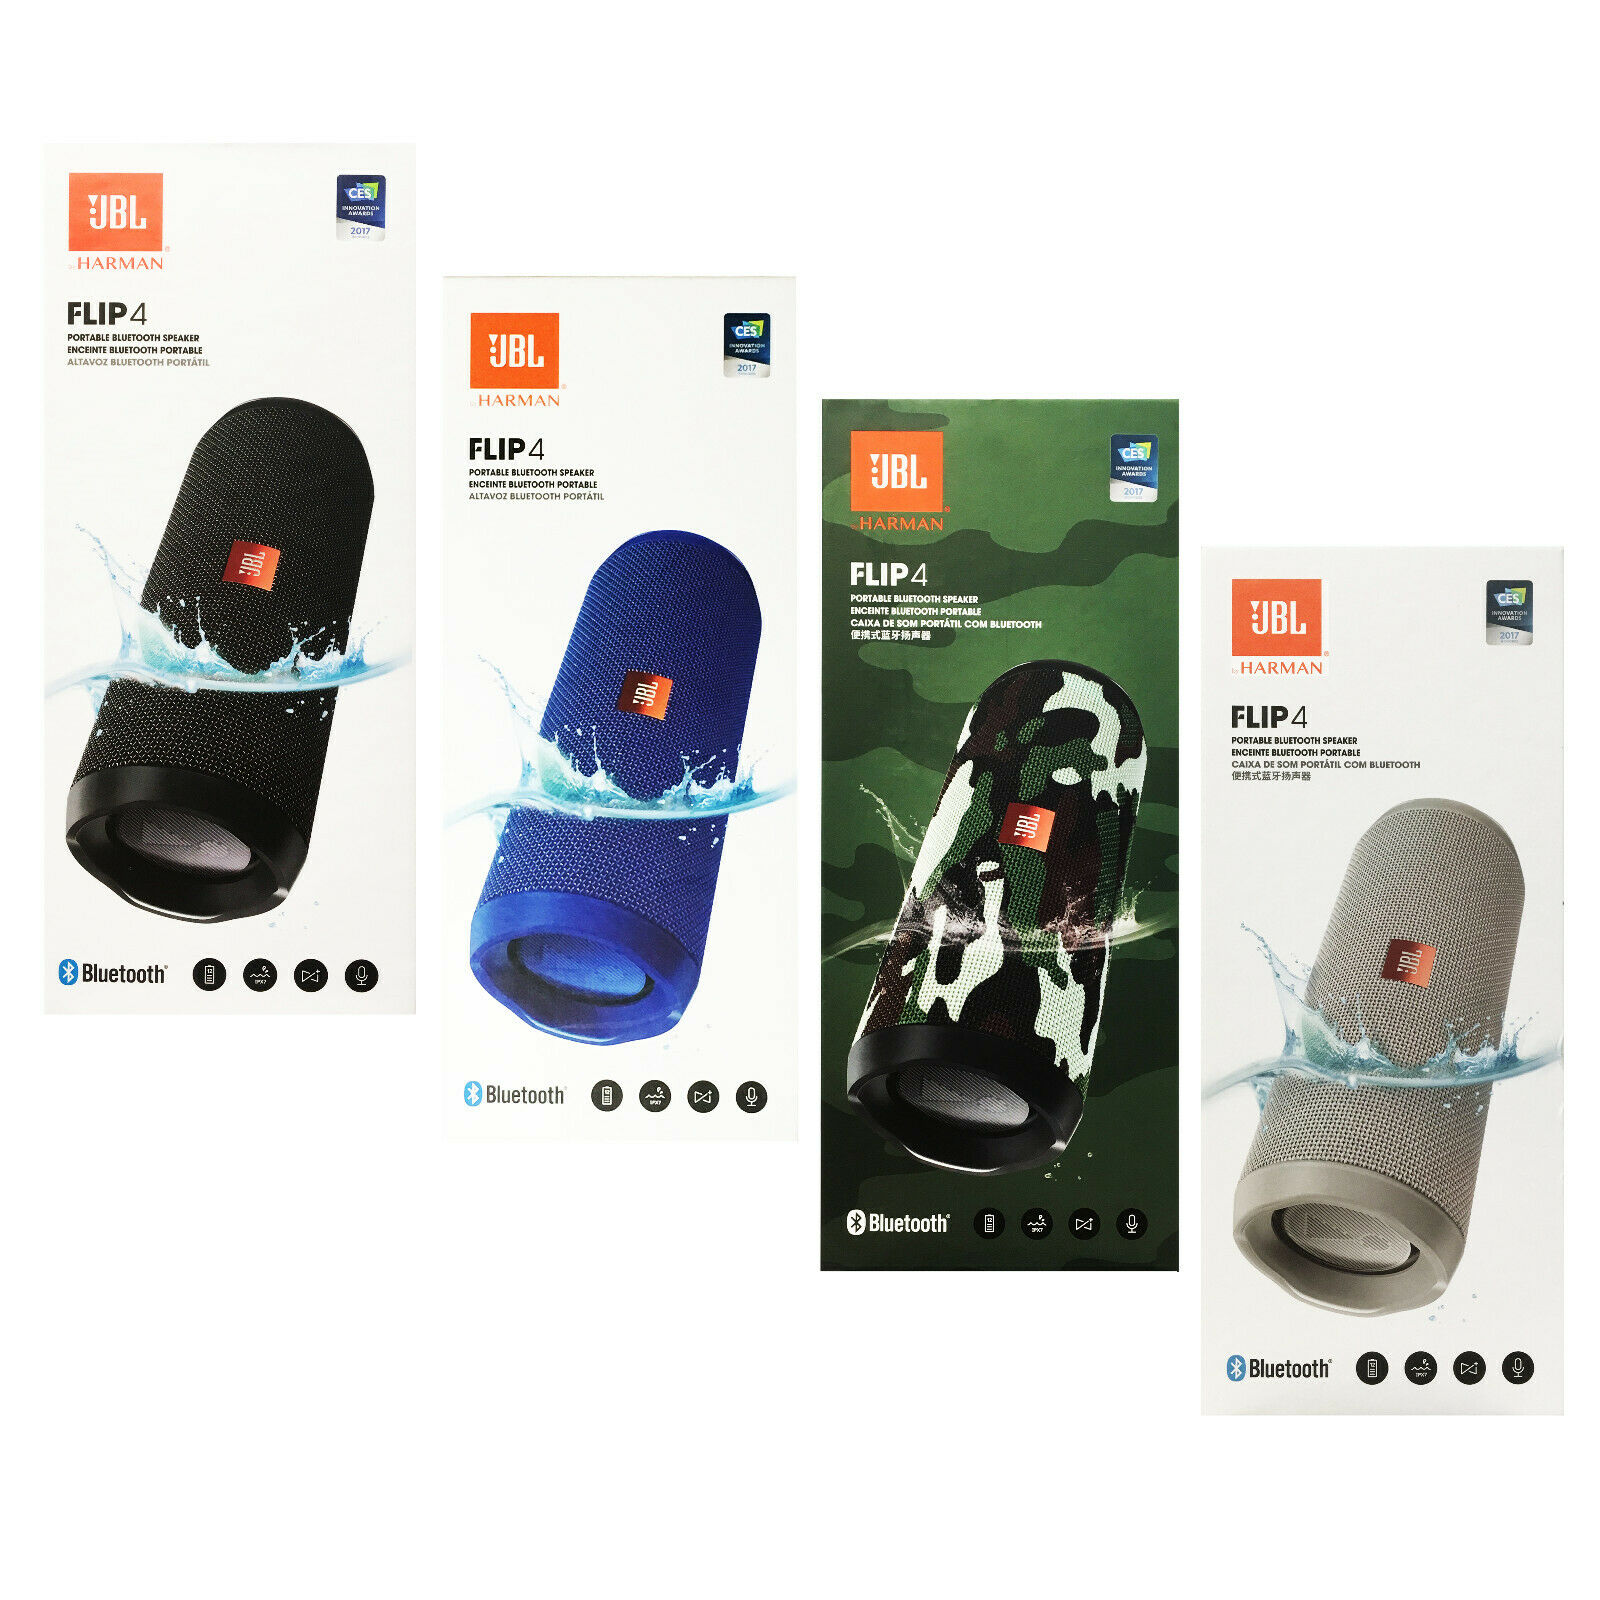 NEW JBL Flip 4 Waterproof Portable Bluetooth Speaker